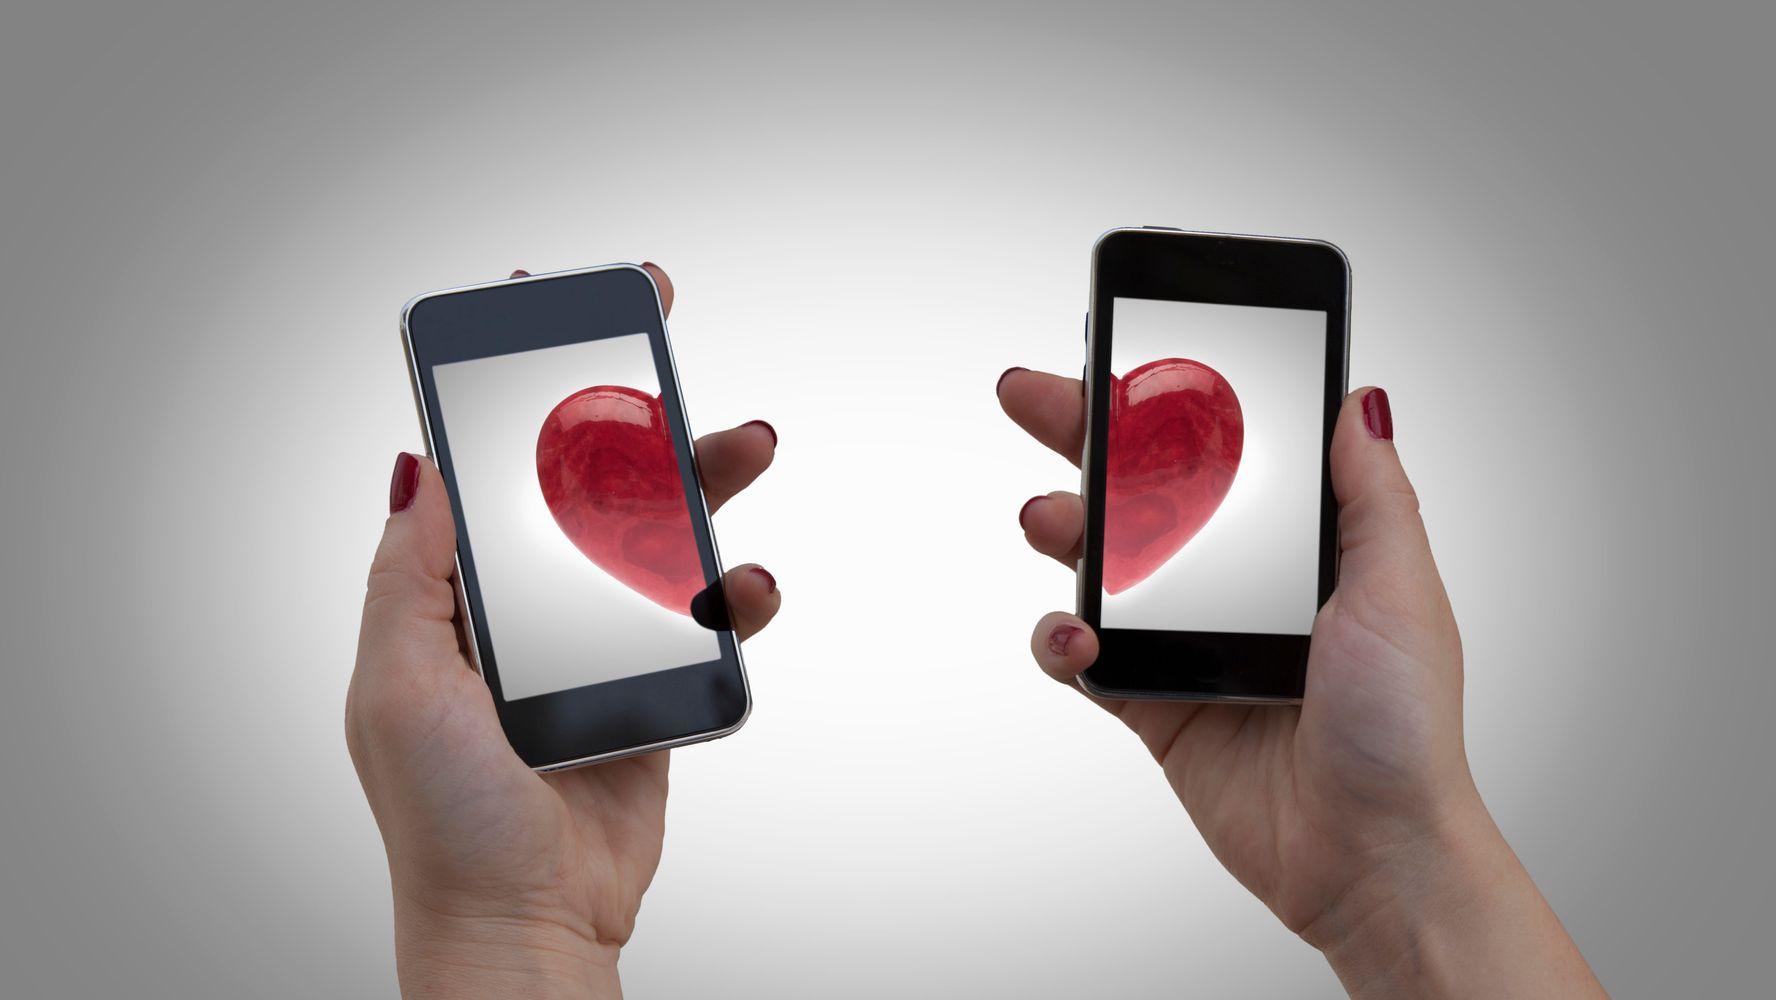 Обои на телефон на двоих на два телефона для пар